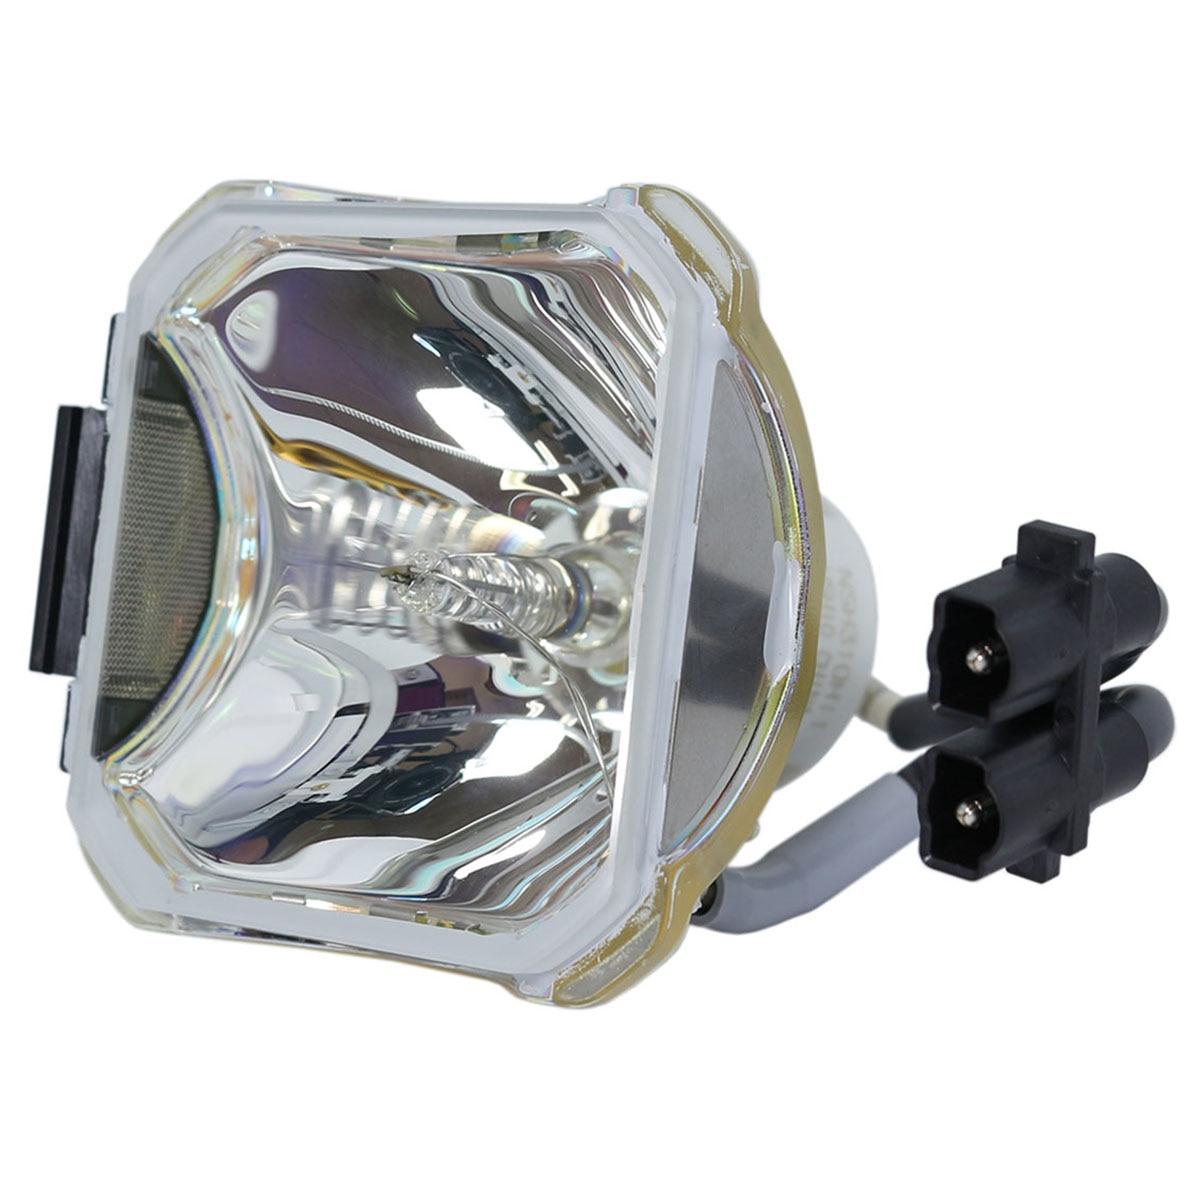 SP-LAMP-016 for Infocus CP-SX1350 CP-X1230 CP-X1250 EDP-X900 LP850 MP4100 SRP-3540/ASK C440 C450 C460 Projector Lamp Bulb цена и фото